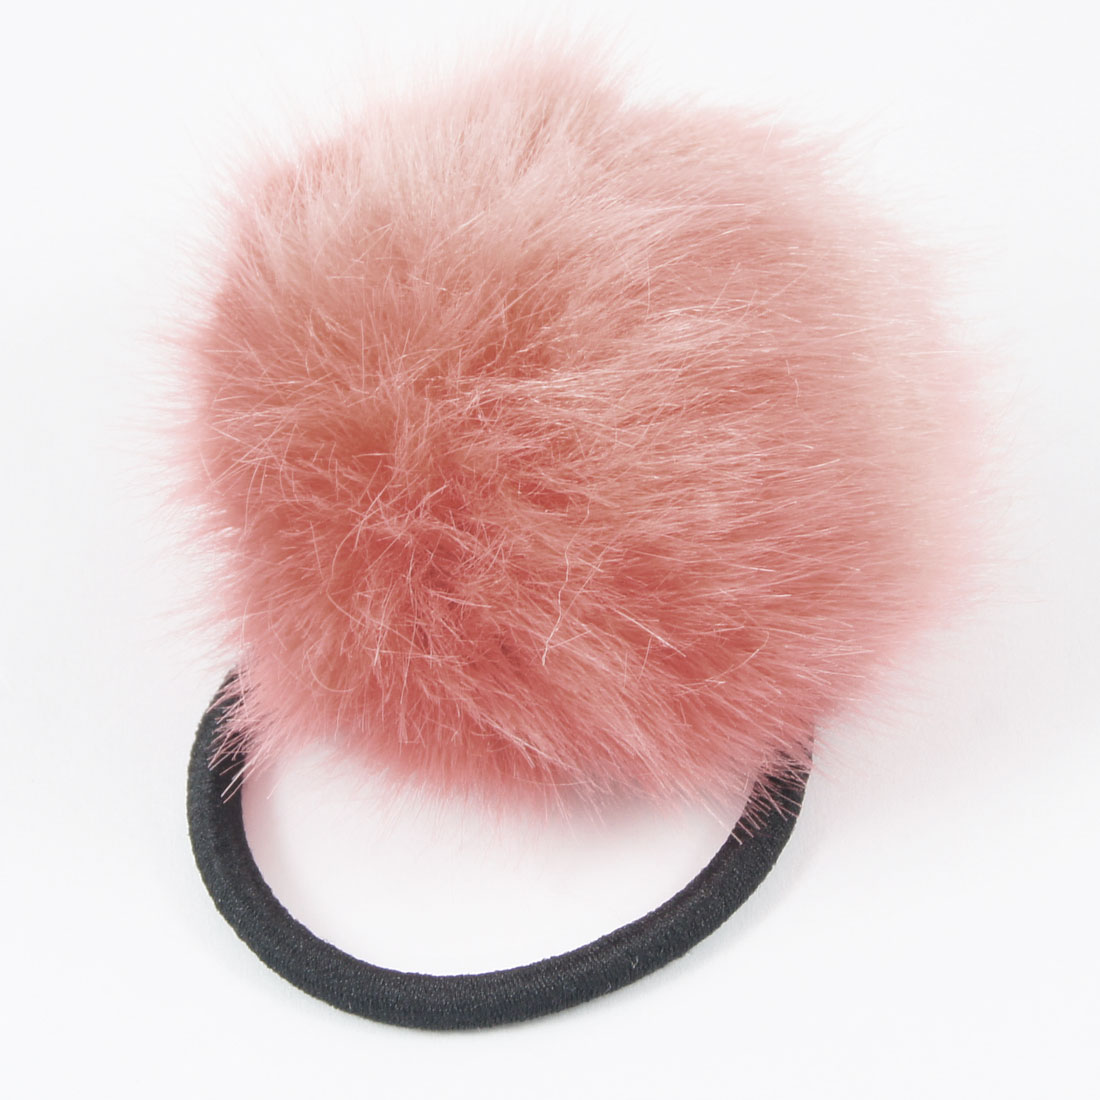 Elastic Band Peach Pink Plush Ball Detail Hair Tie Ponytail Holder for Ladies